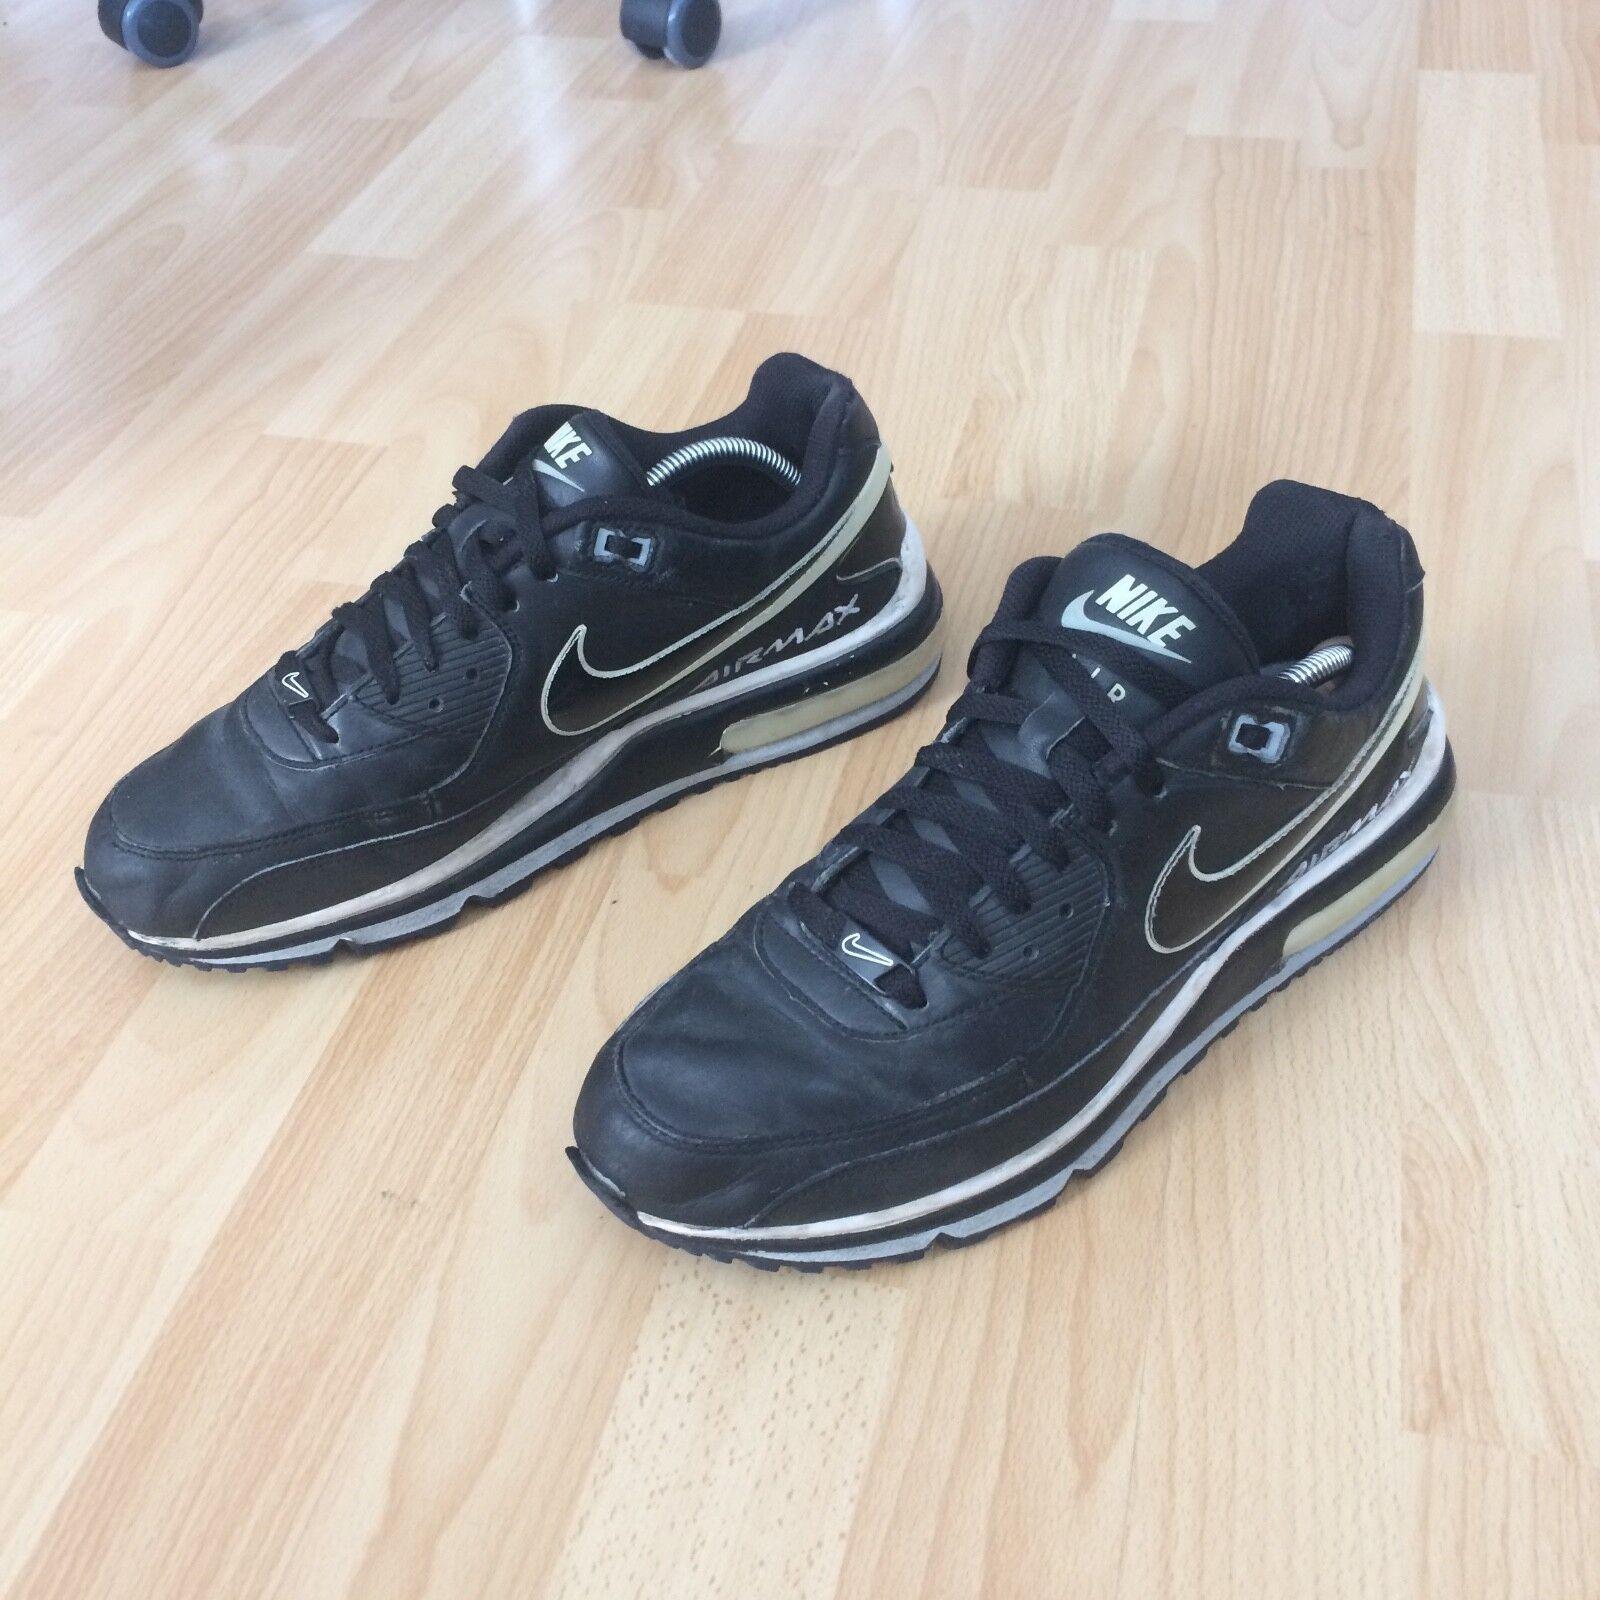 NIKE AIR MAX LTD II 2 - Classic LEATHER Sneaker in Gr. 45